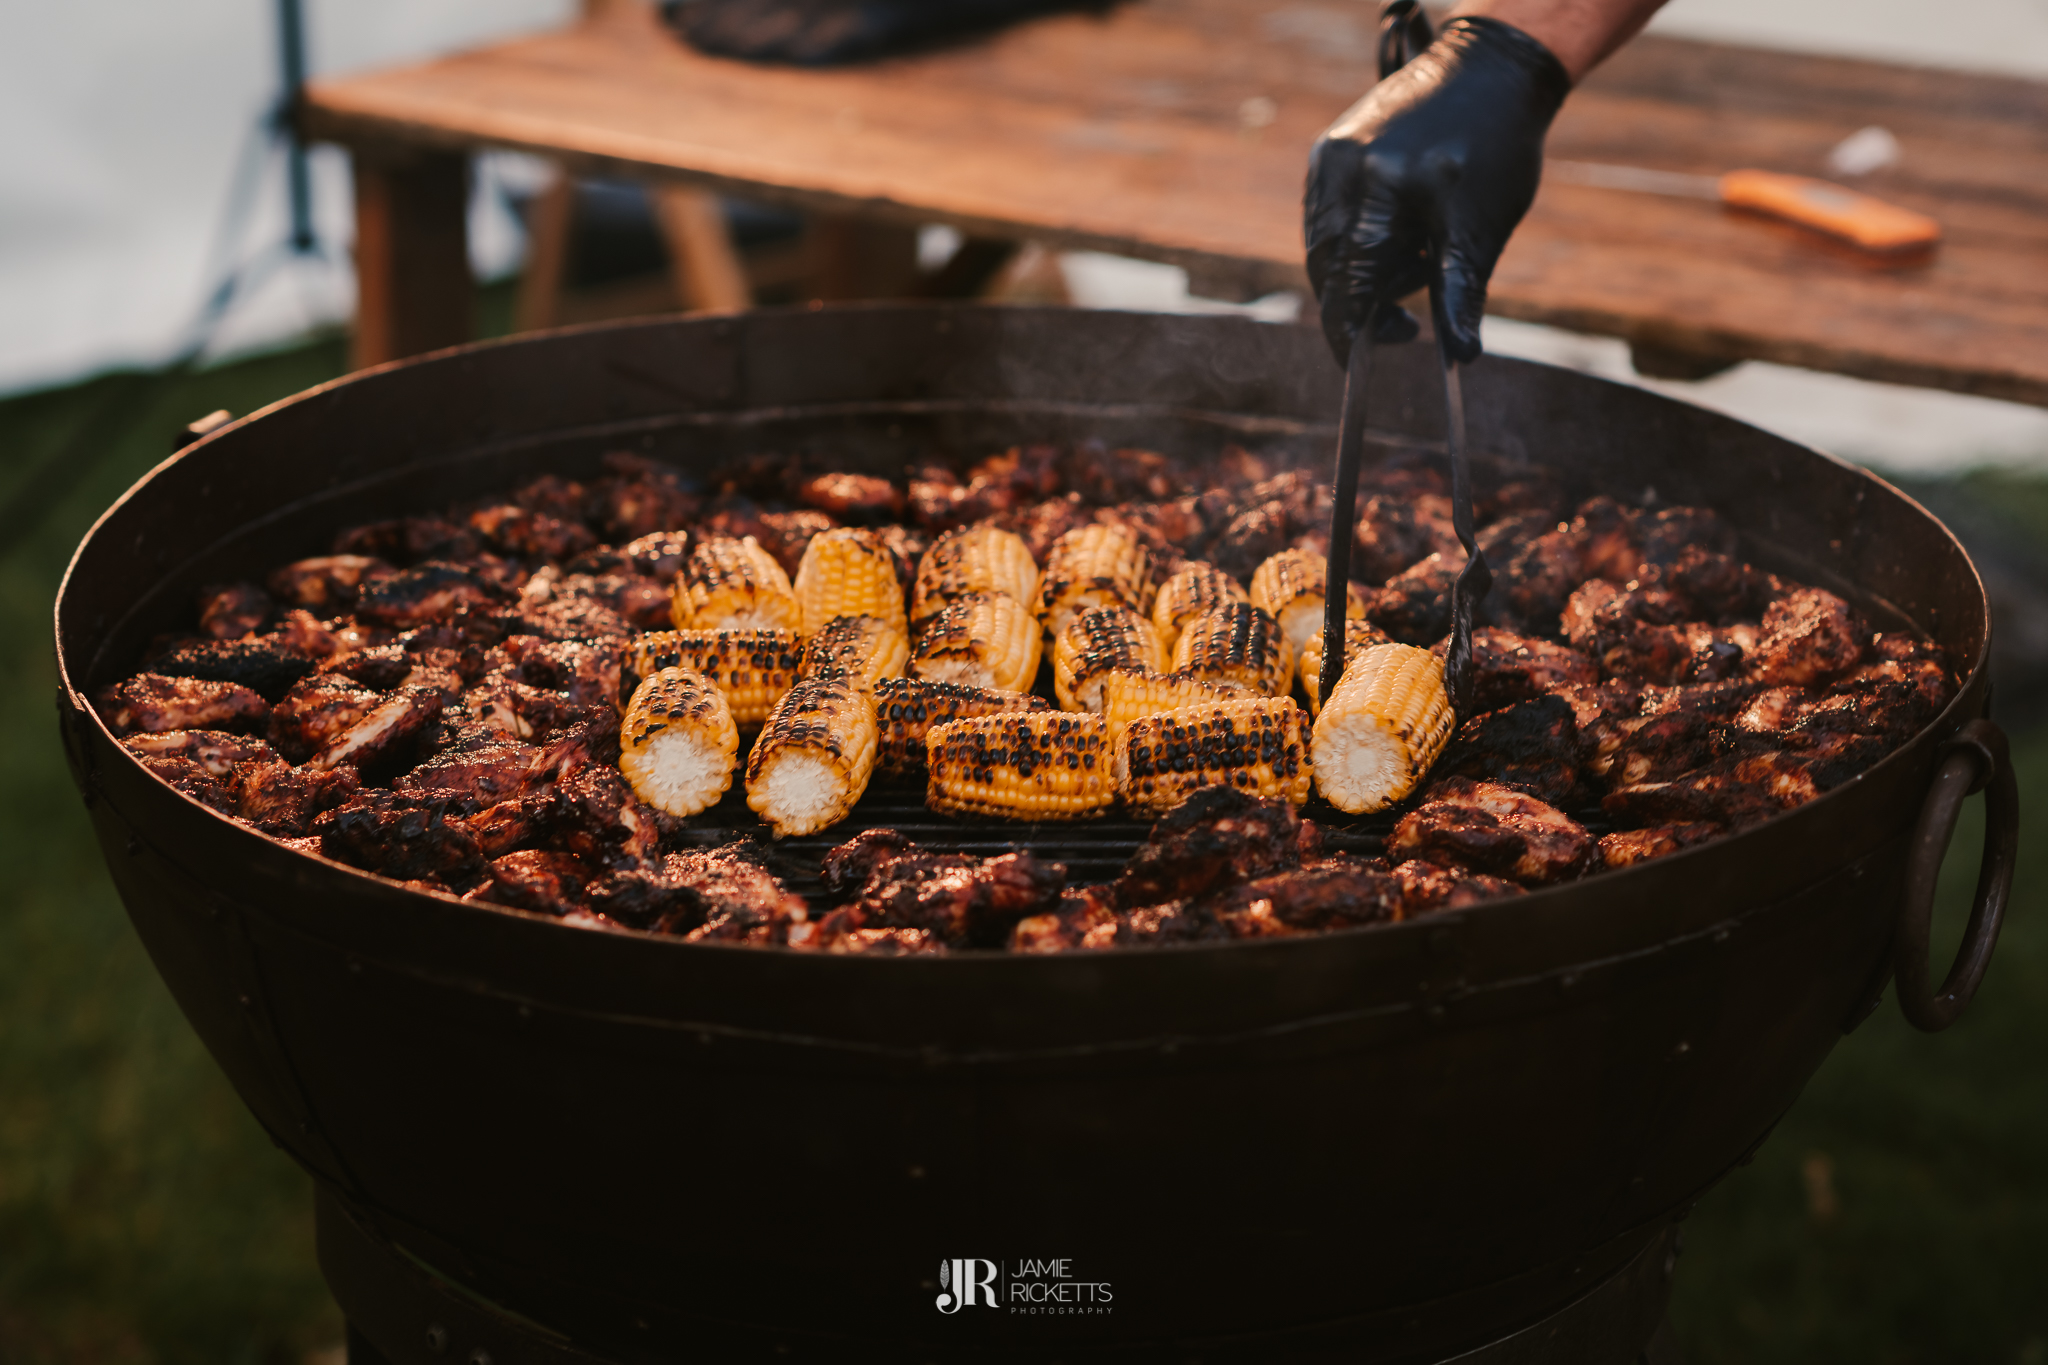 BBQ BANQUET NIGHT-28.06.2019-JR-SM-75.JPG